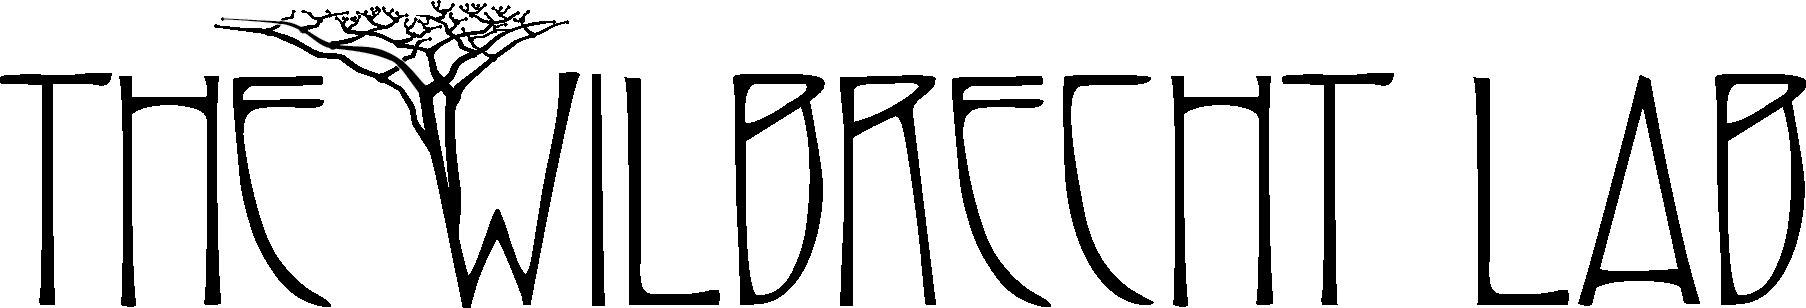 Wilbrecht Lab Retina Logo